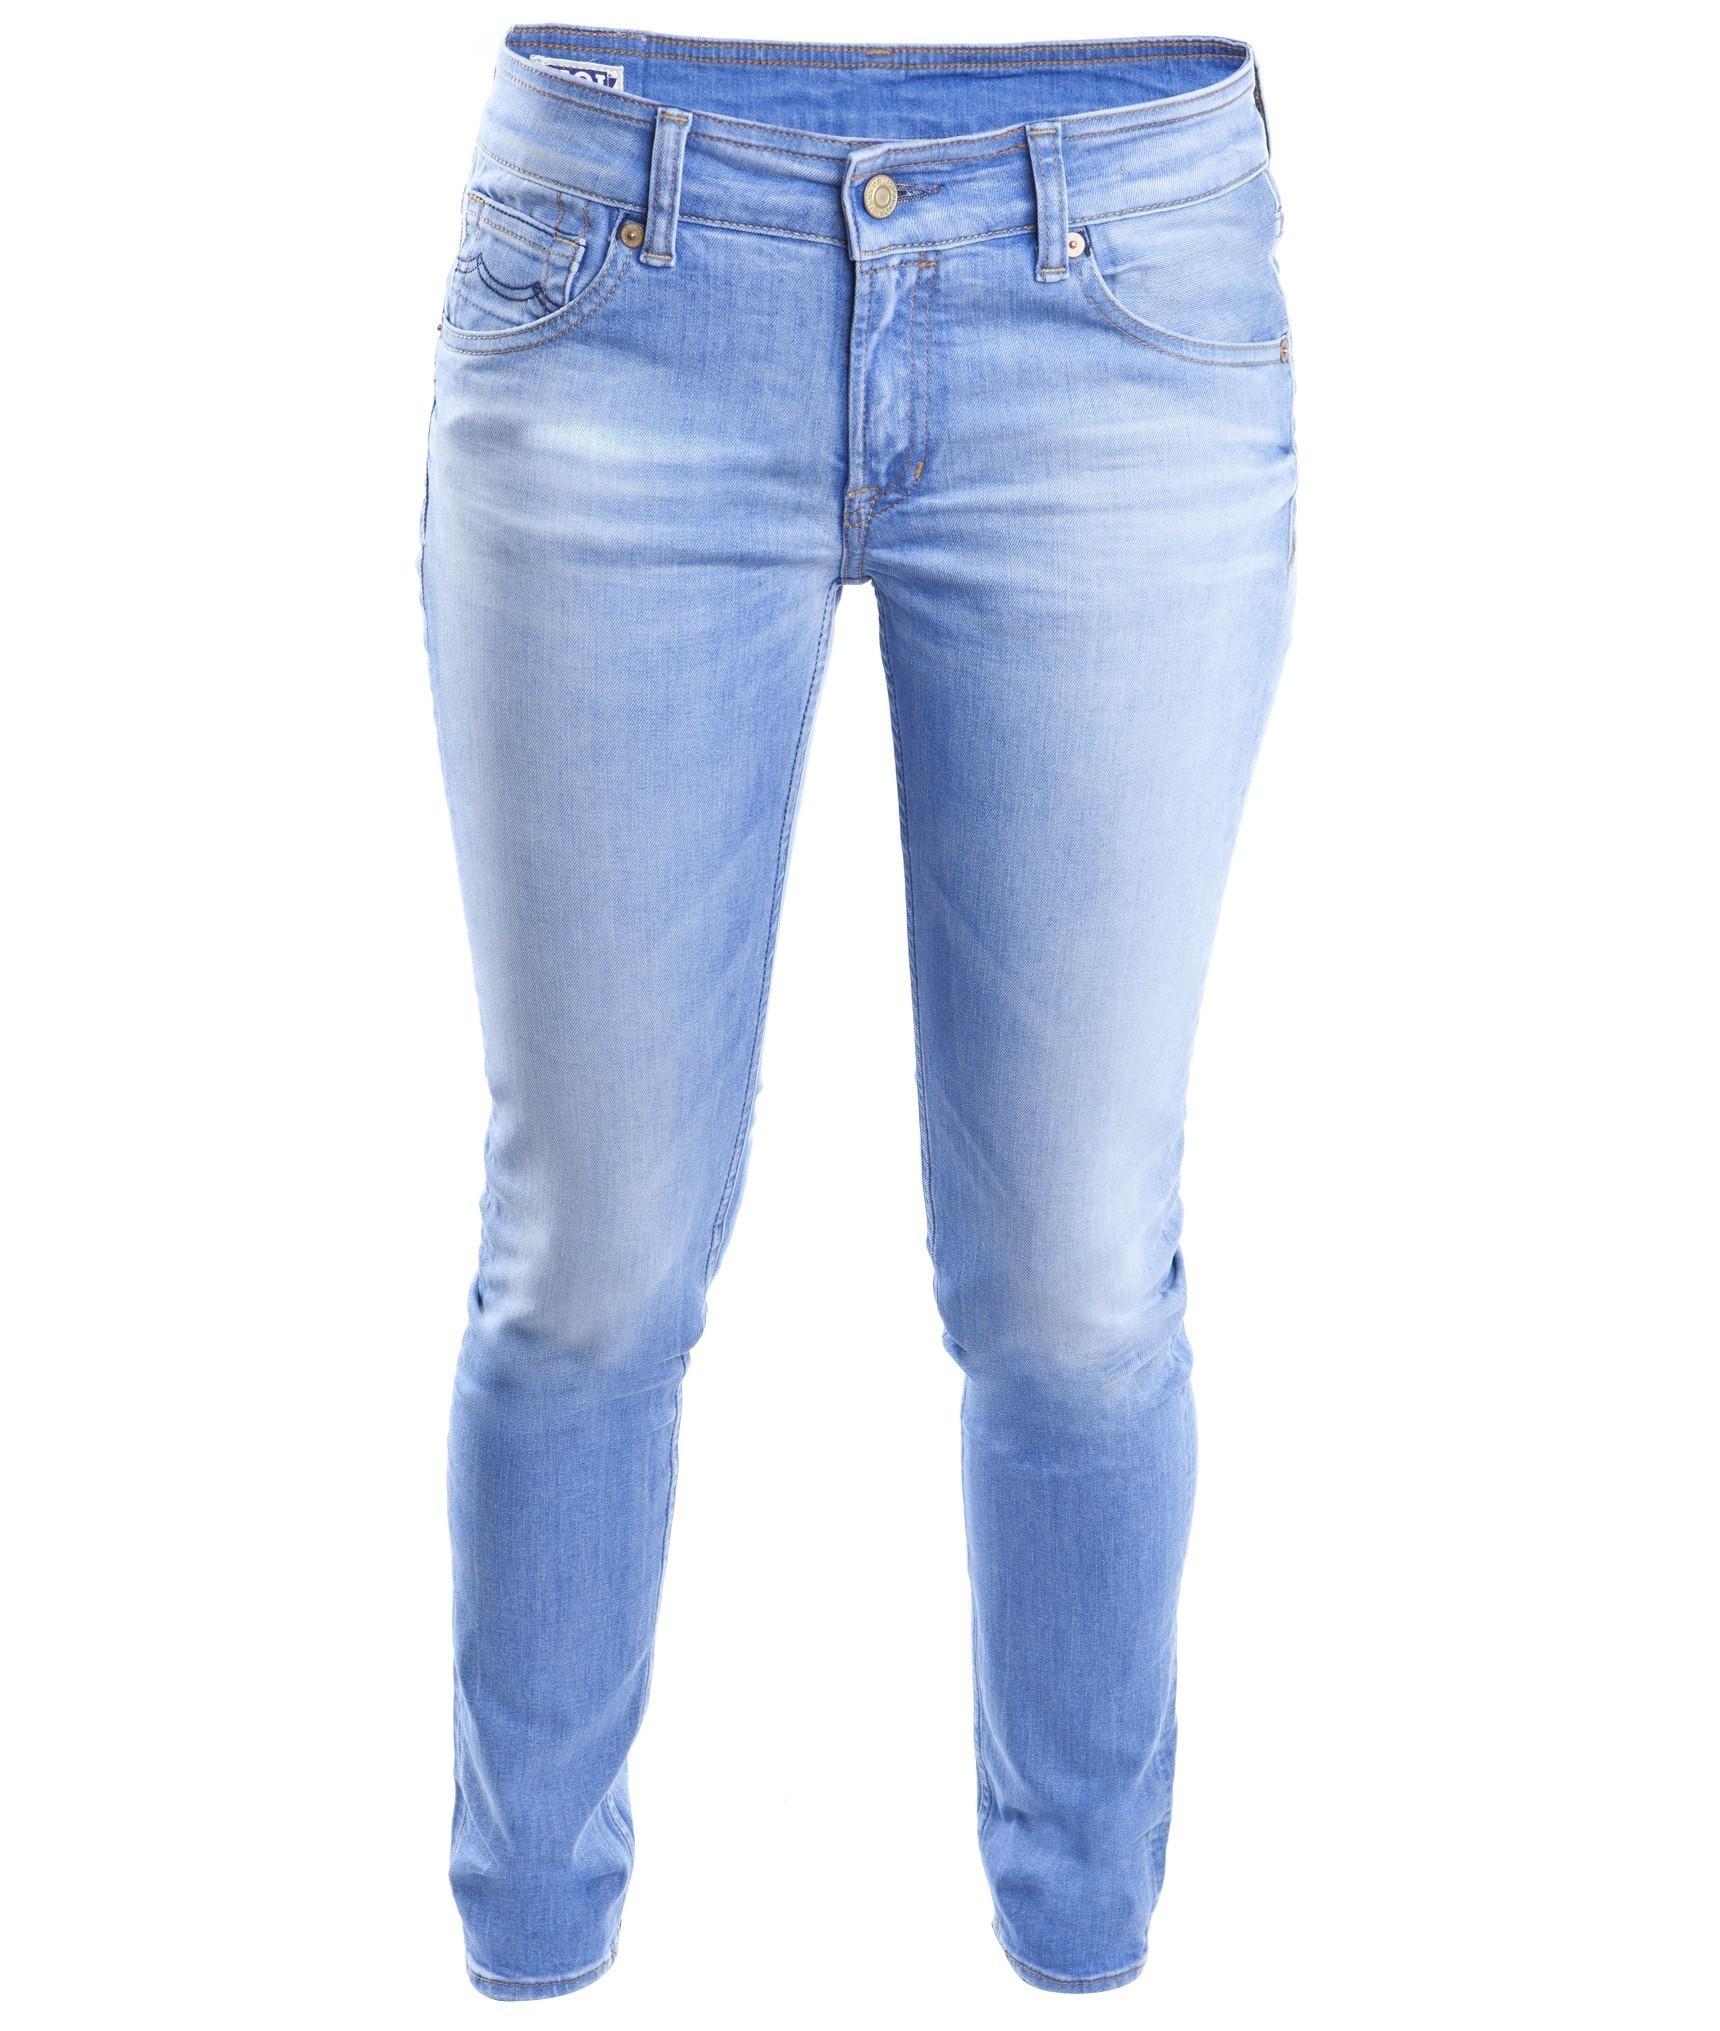 Kings Of Indigo   K.O.I. Juno Organic French Blue Worn U2022 Jeans Bio Jeans  Für Damen Bei Glore U2022 Glore